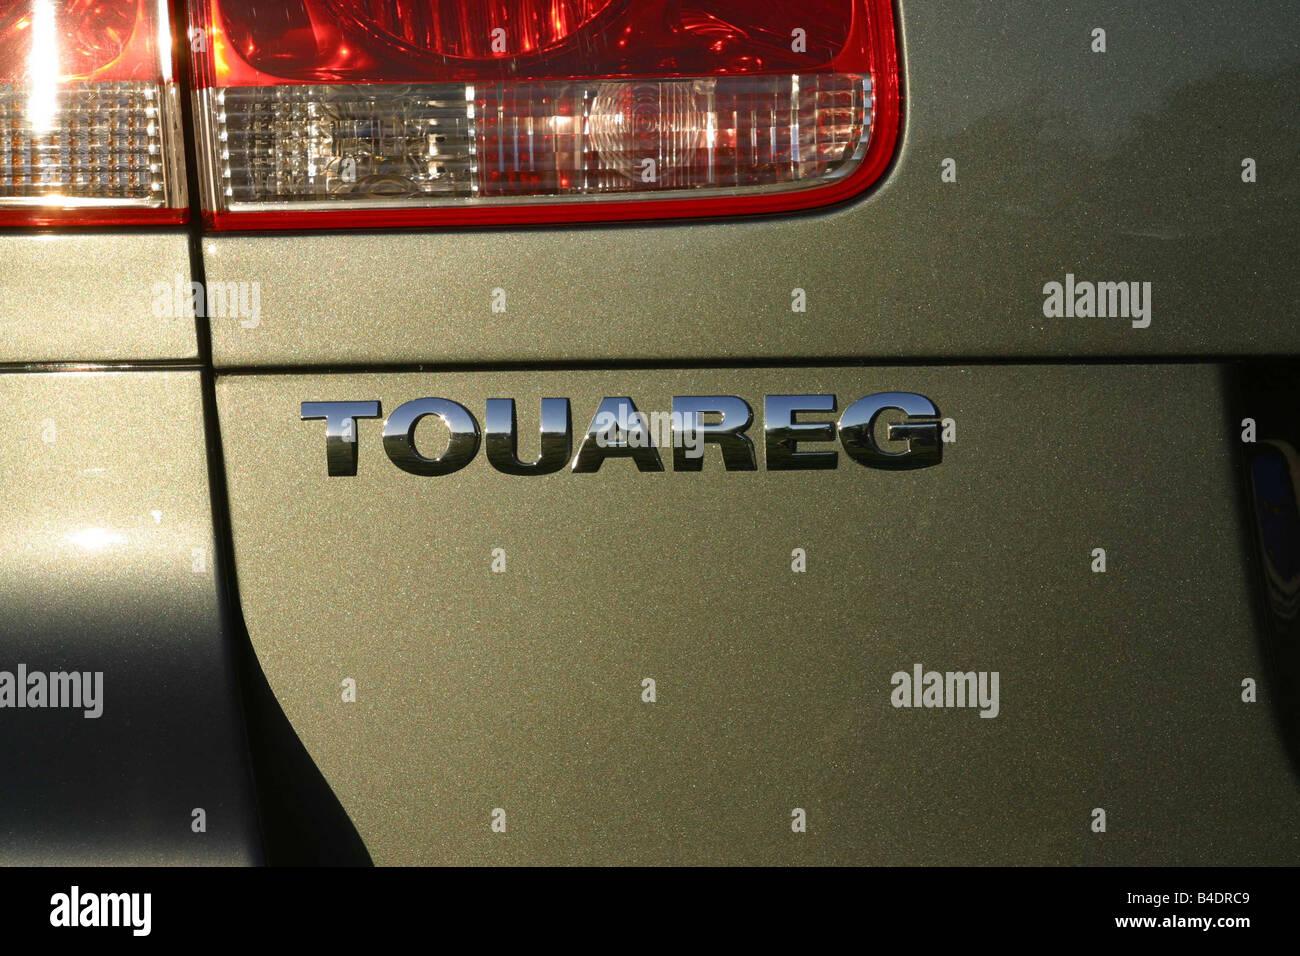 Car Vw Volkswagen Touareg V10 Stockfotos Car Vw Volkswagen Touareg